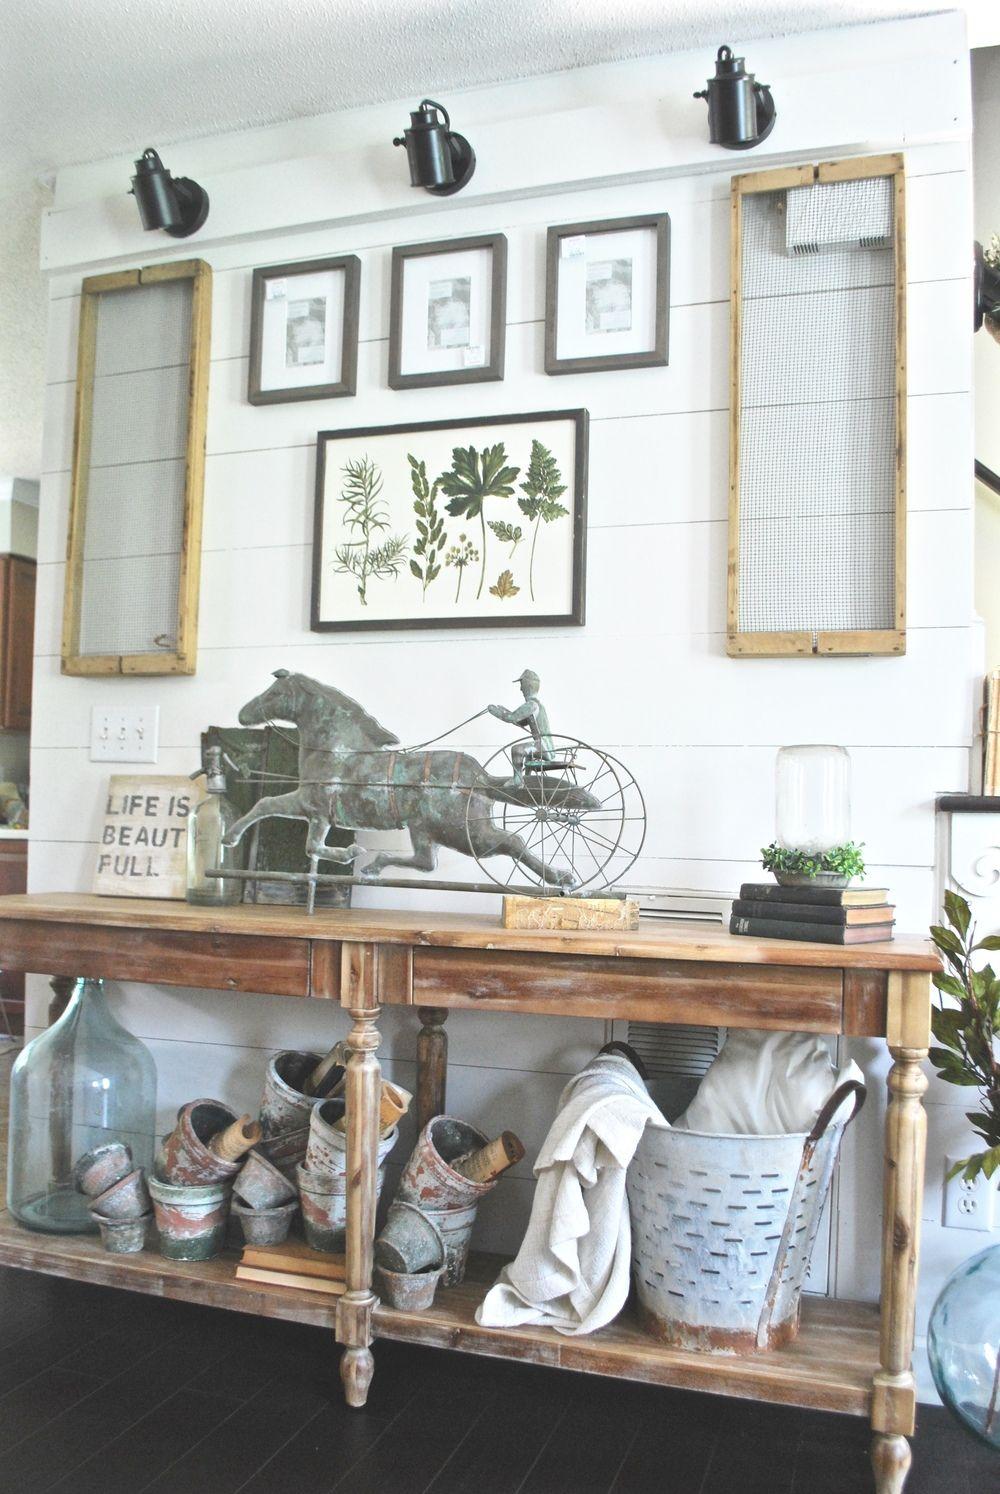 Best Urban Farmhouse Wall Decor For A Rustic Country Home Farmhousewalldecor Modernfarmhousewallideas